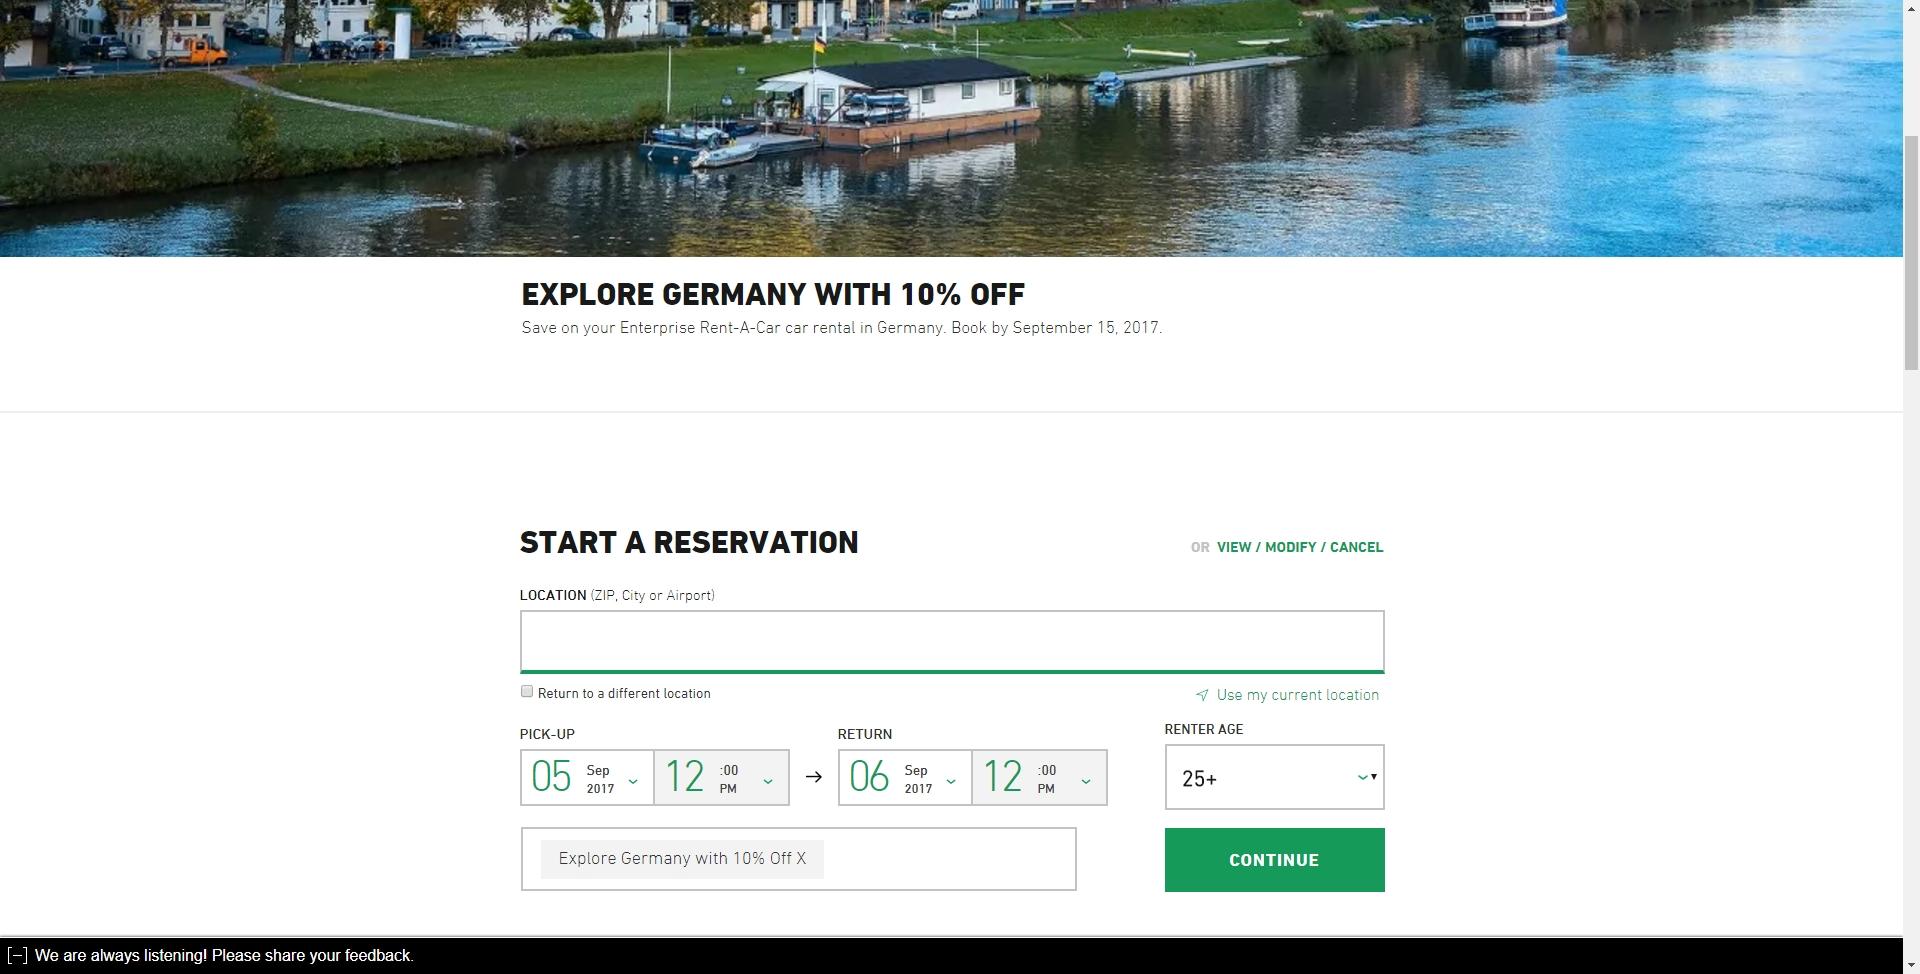 Enterprise car rental coupons 2019